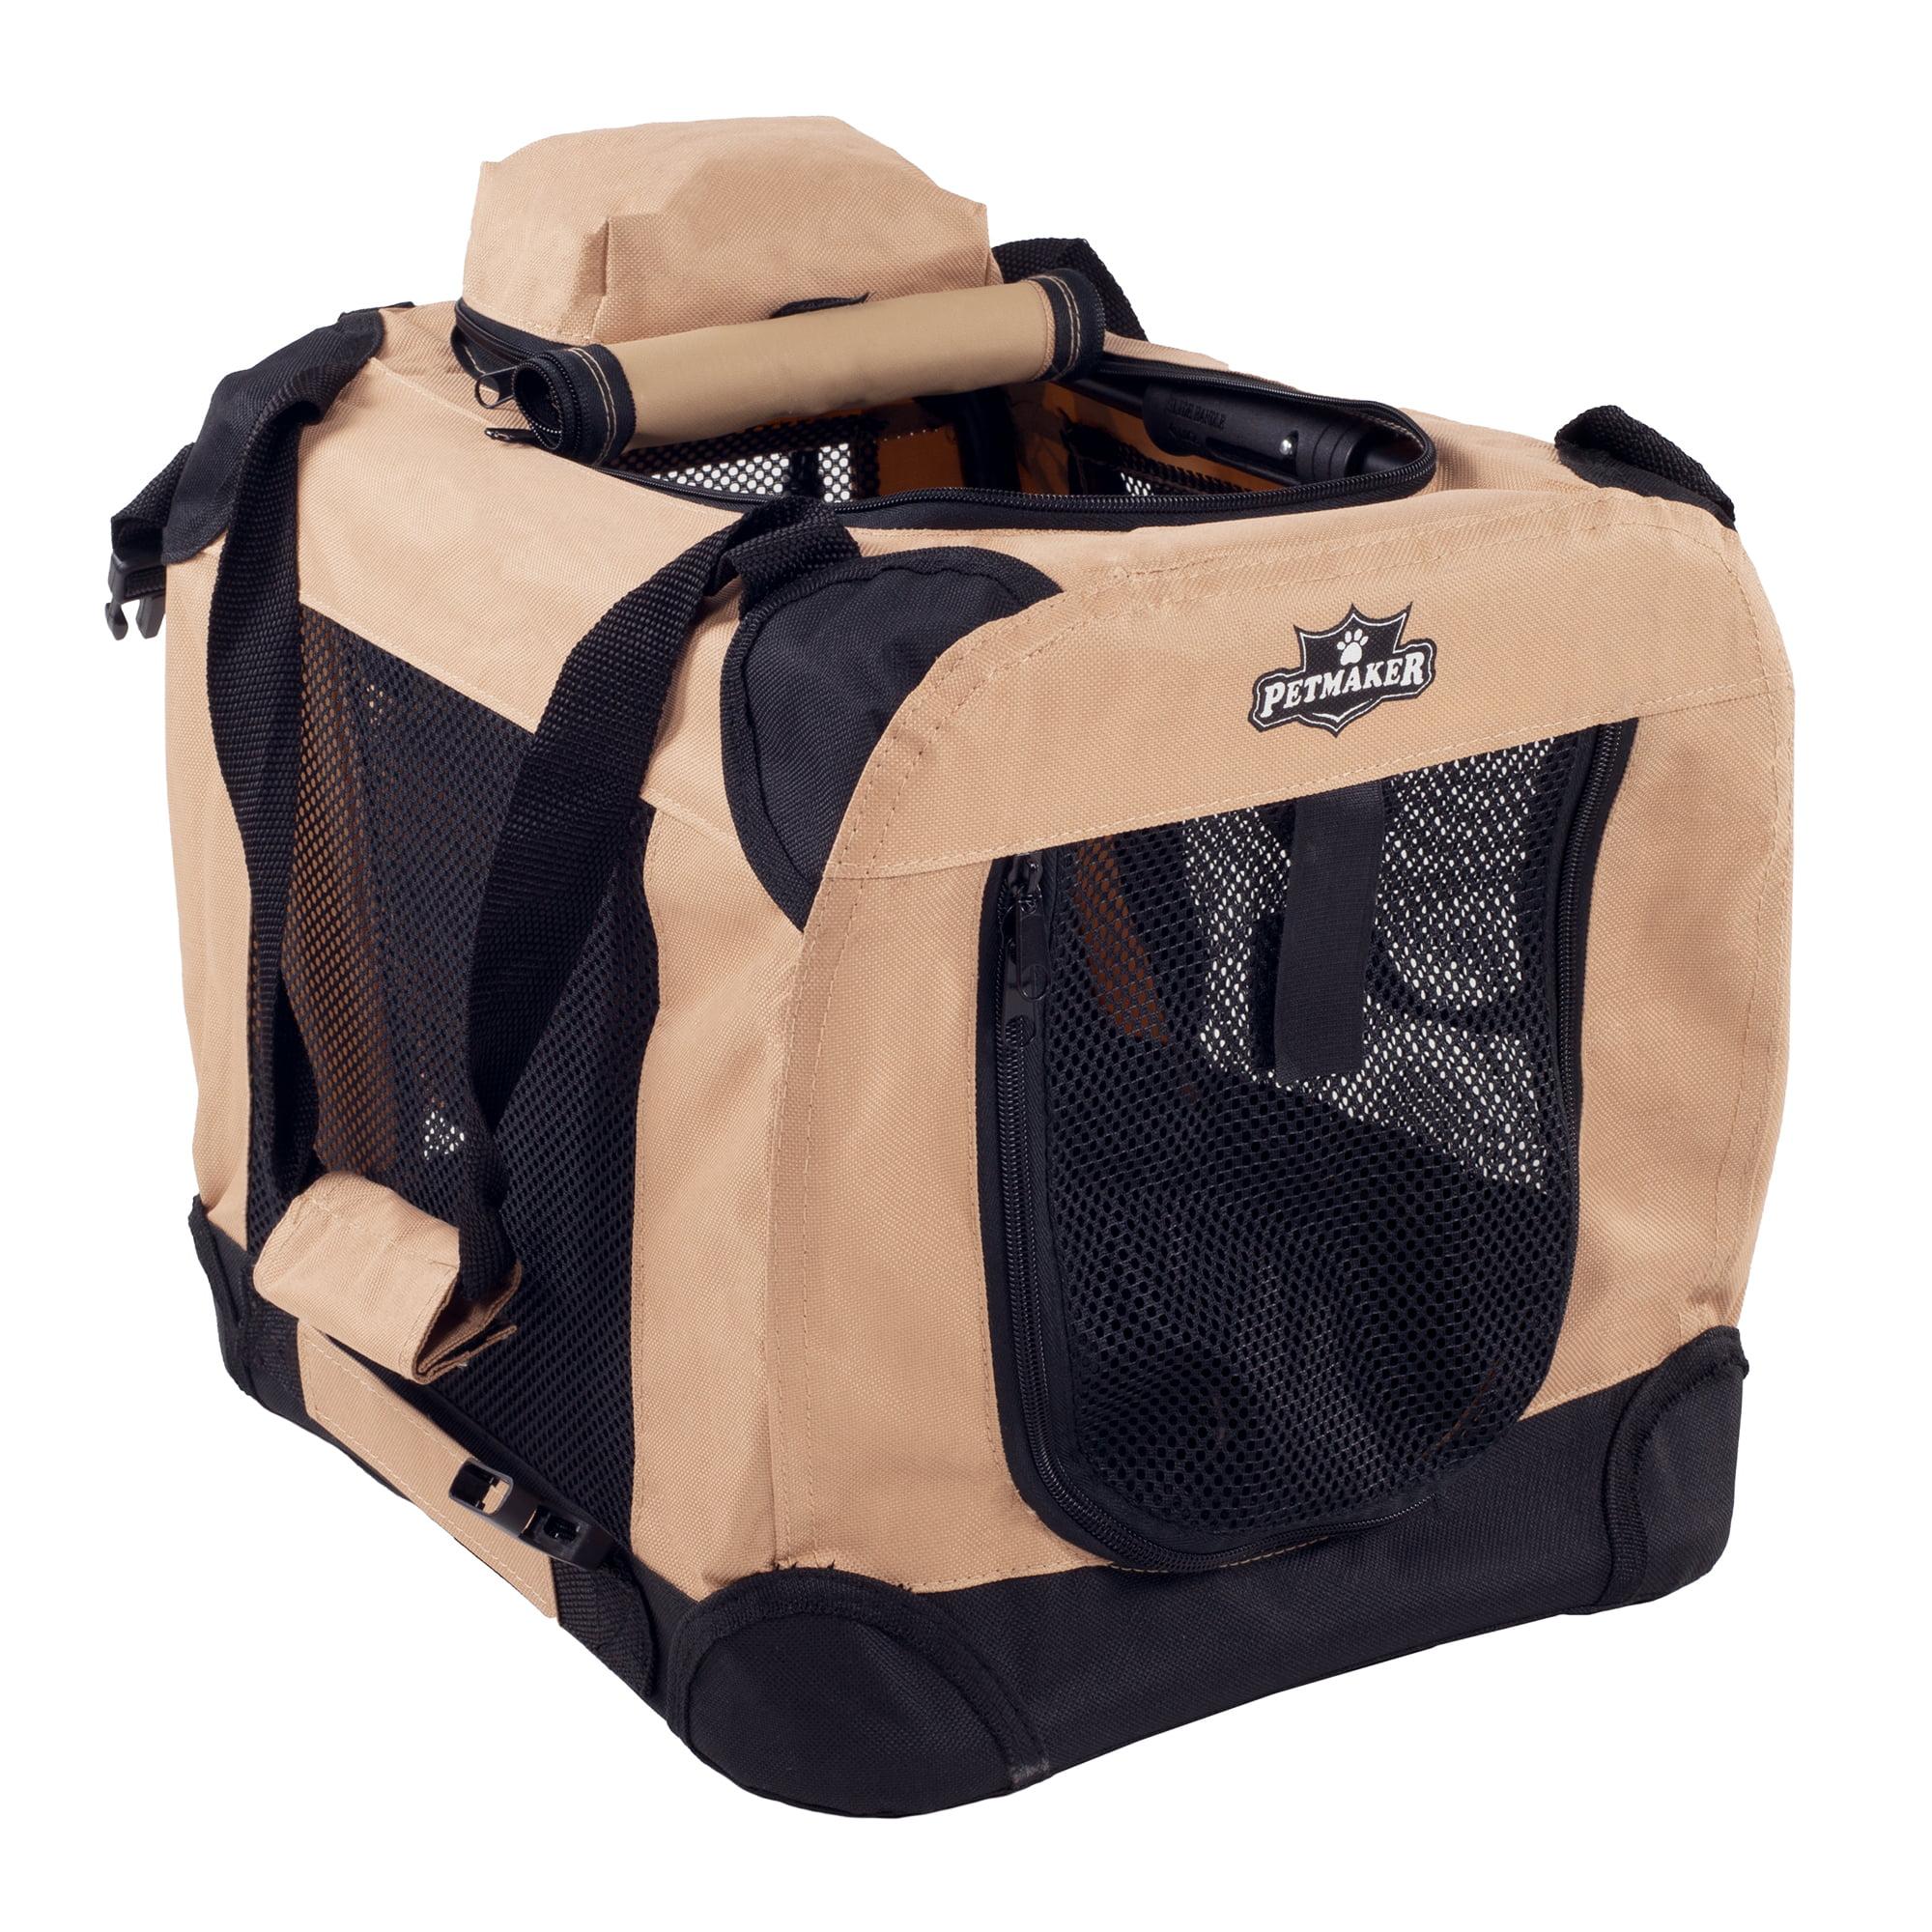 "Portable Soft Sided Pet Dog Crate-16"" x 12"" -Khaki"